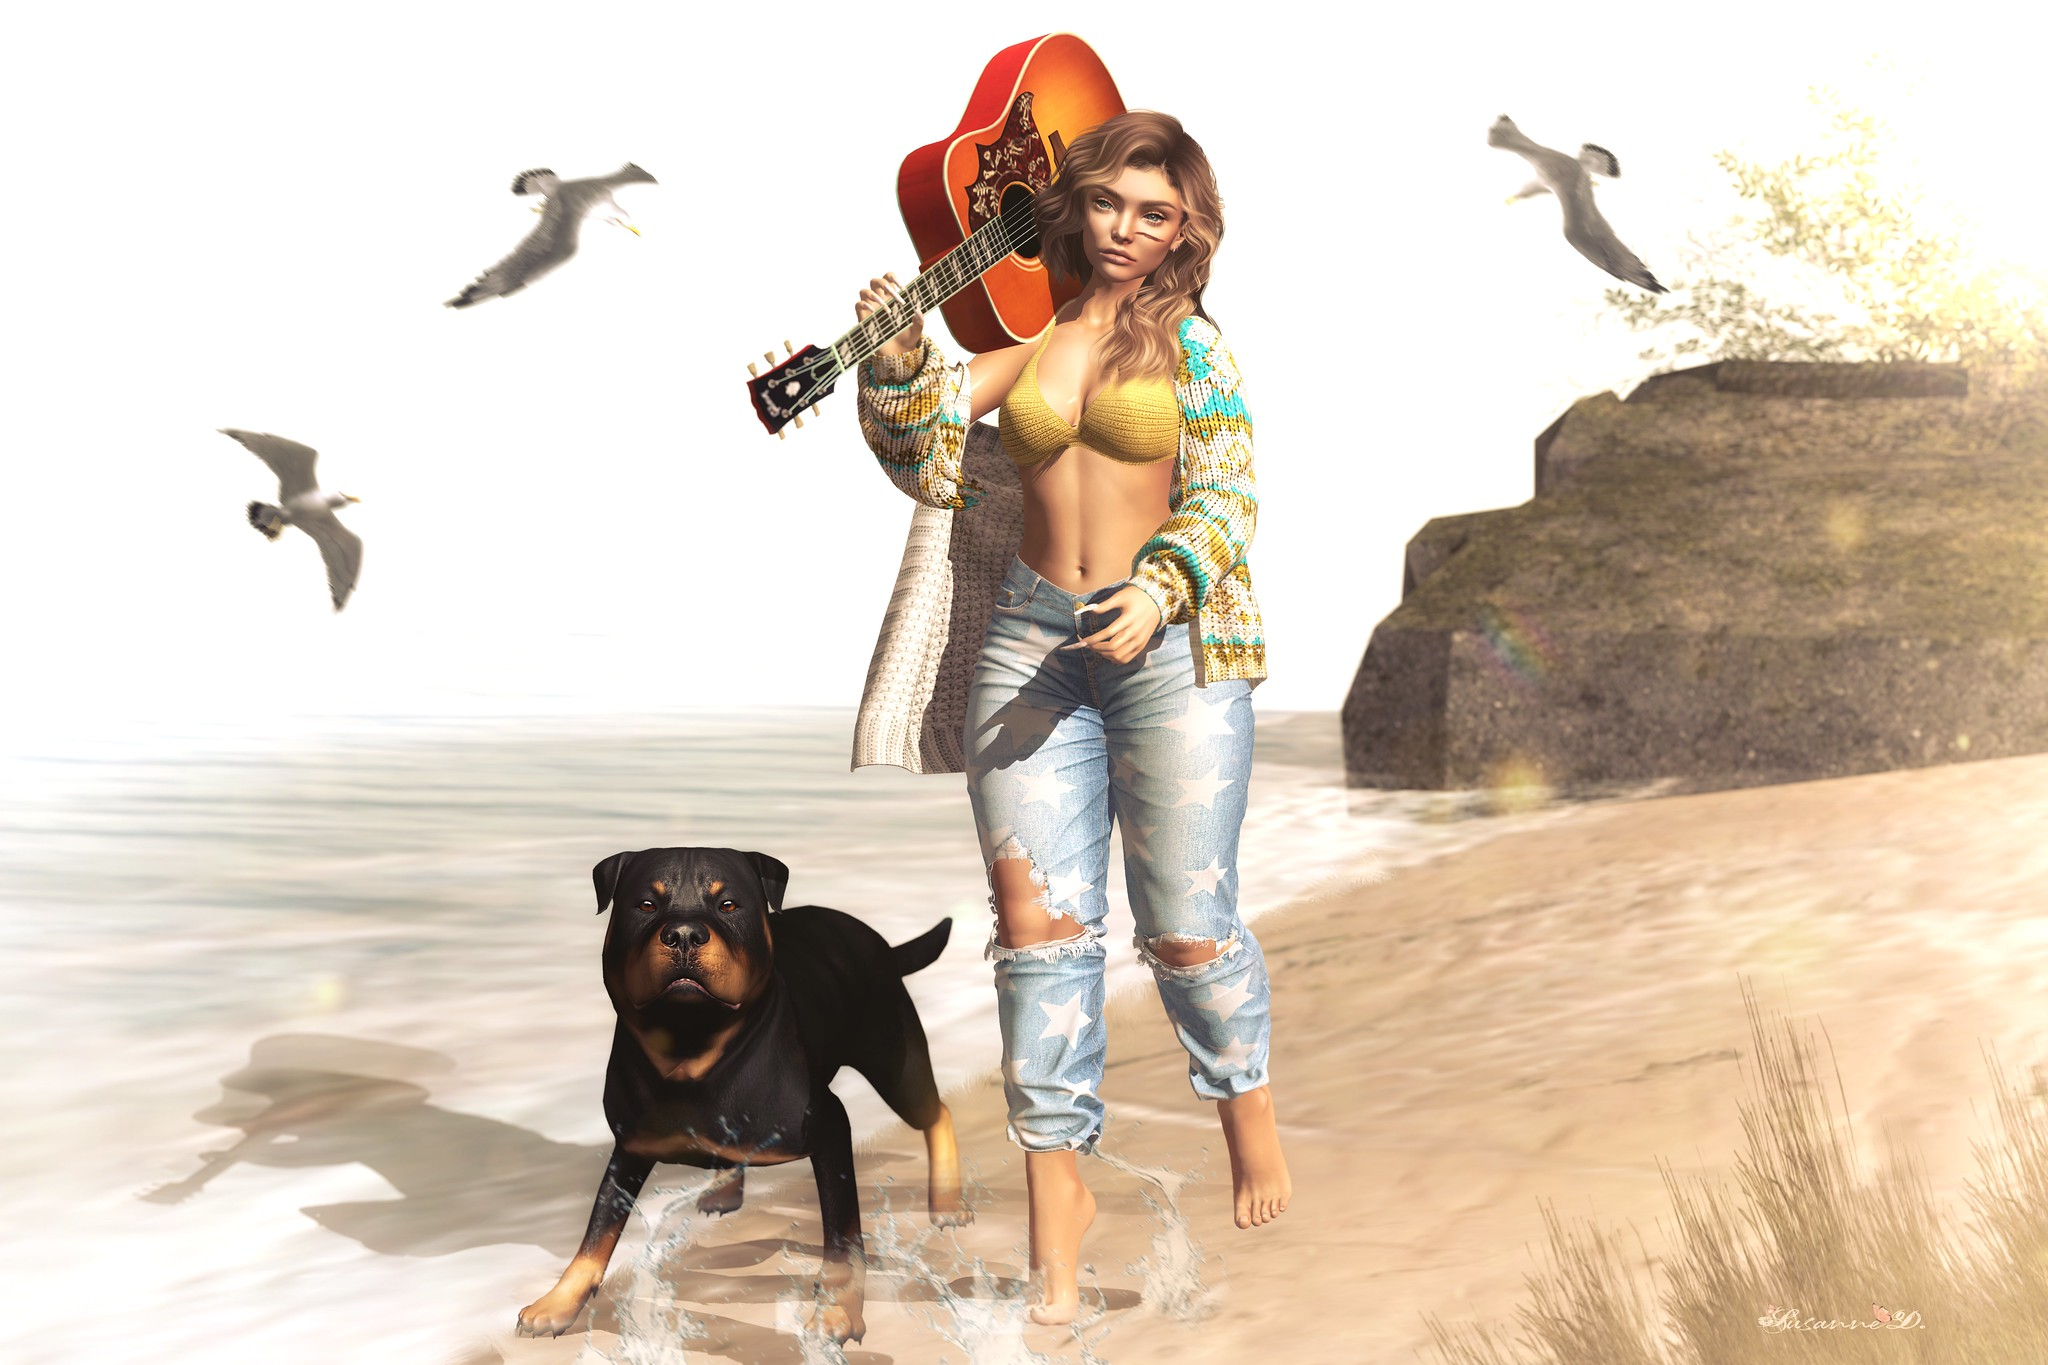 Ofra - Walk on the beach